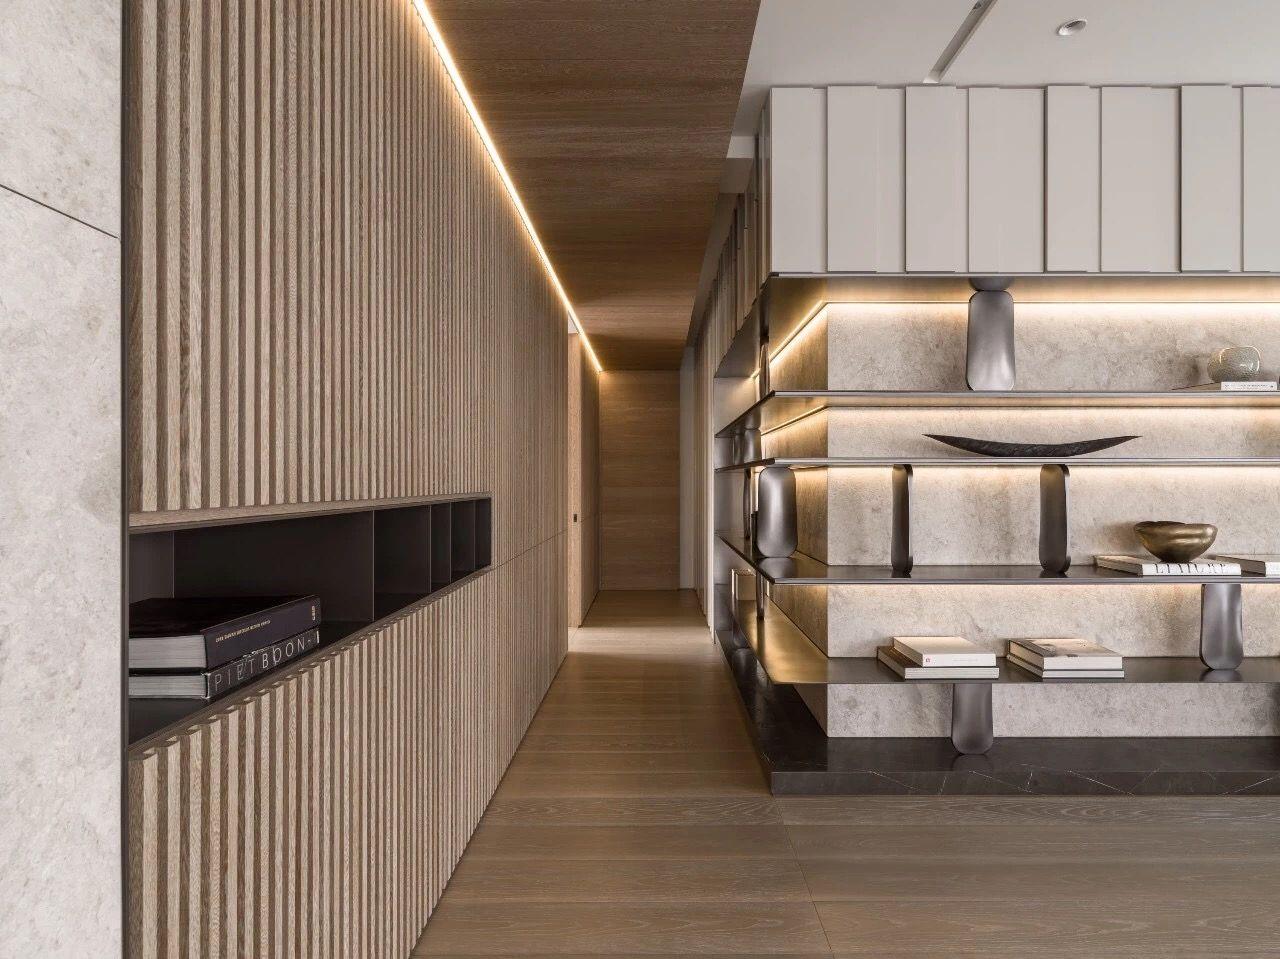 Pin By 冯宁 Fornning On A 客厅 Living Room Hotel Bedroom Design Interior Design Living Room Interior Cladding